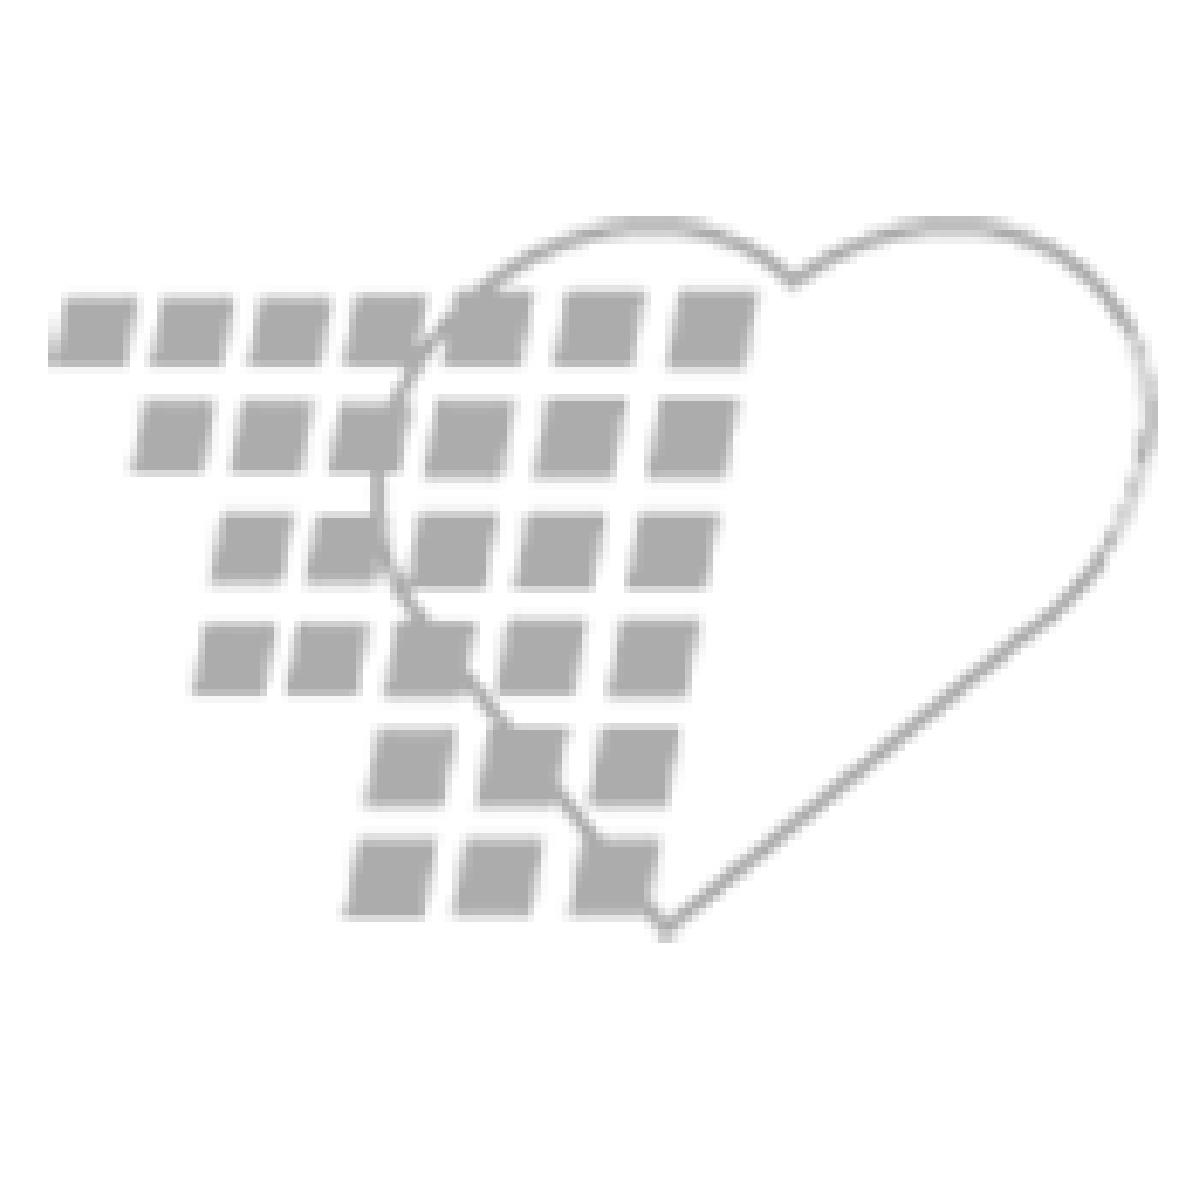 02-38-9012 Assure® Lance Plus Safety Lancet - 25G